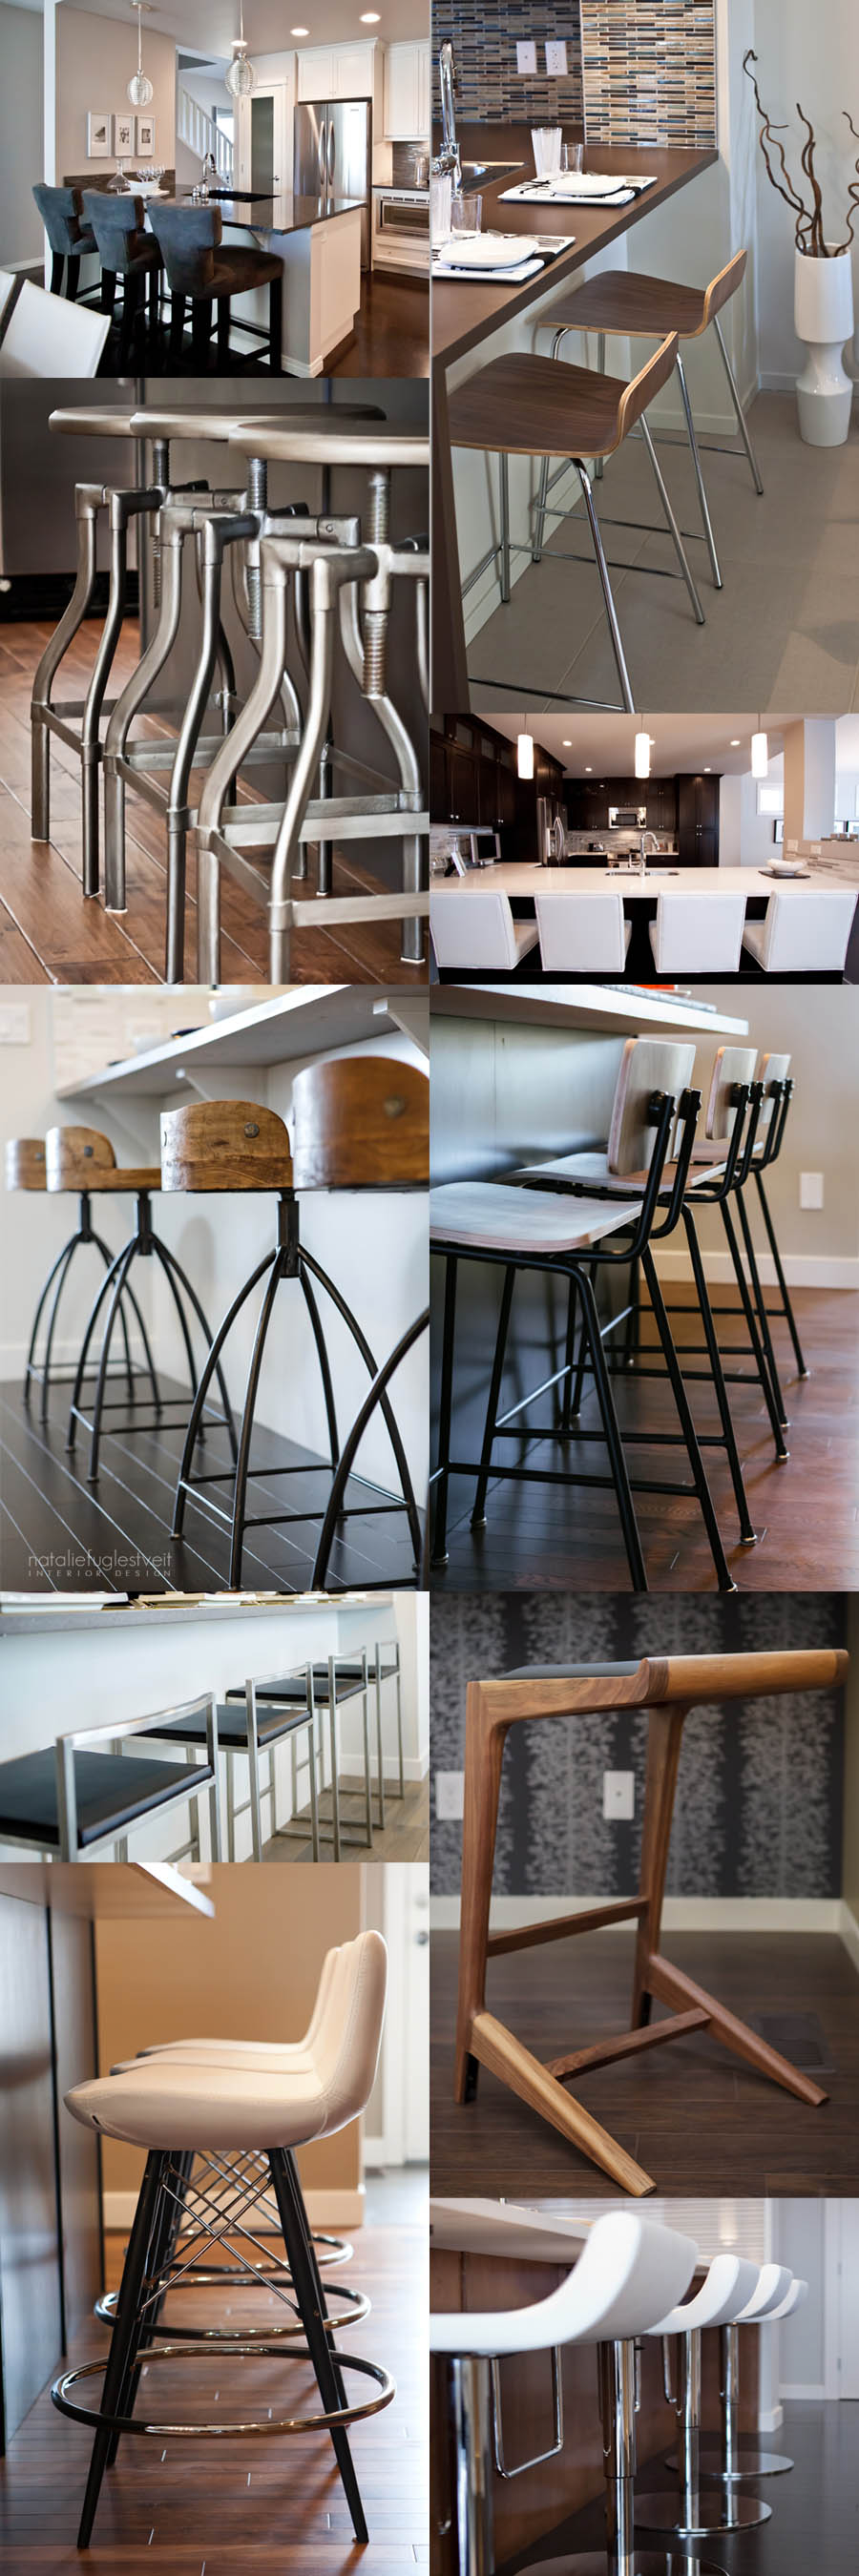 Counterstools, Barstools, Modern Stools, Rustic Stools, Leather Stools, White Leather Stools, Upholstered Stools, Furniture, Calgary Interior Designer